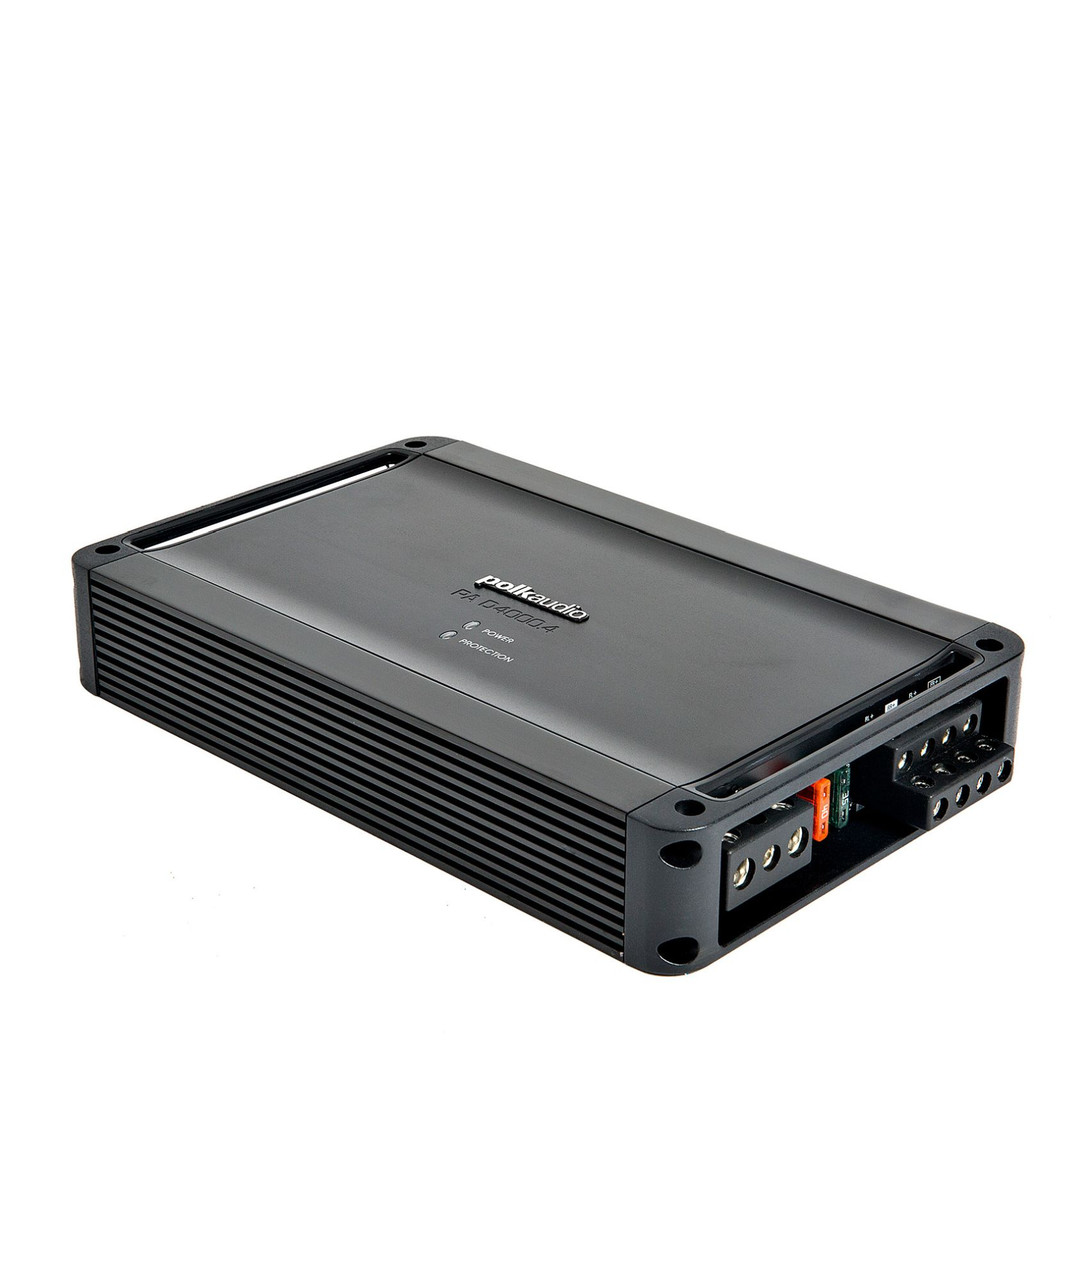 medium resolution of polk audio for dodge ram 94 2011 a pair of db652 6 5 s a pair of db692 6x9 s pa d4000 4 amp wire kit creative audio